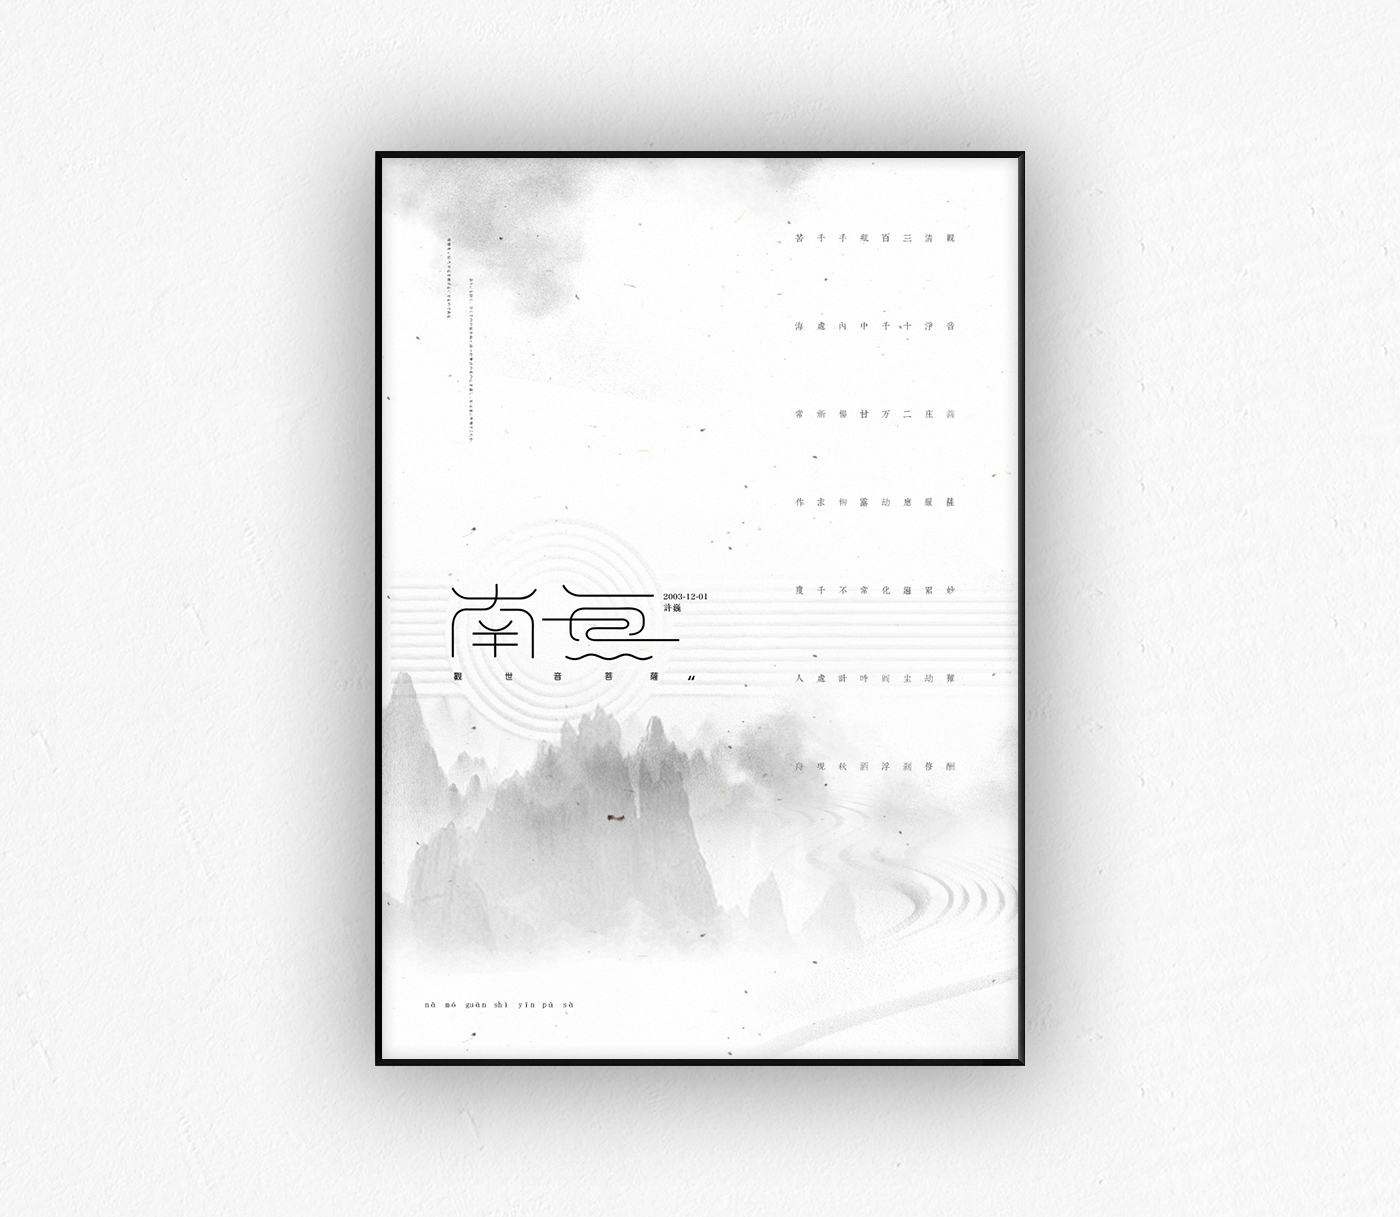 poster font 字体设计 字体 海报 视觉 排版 黑白